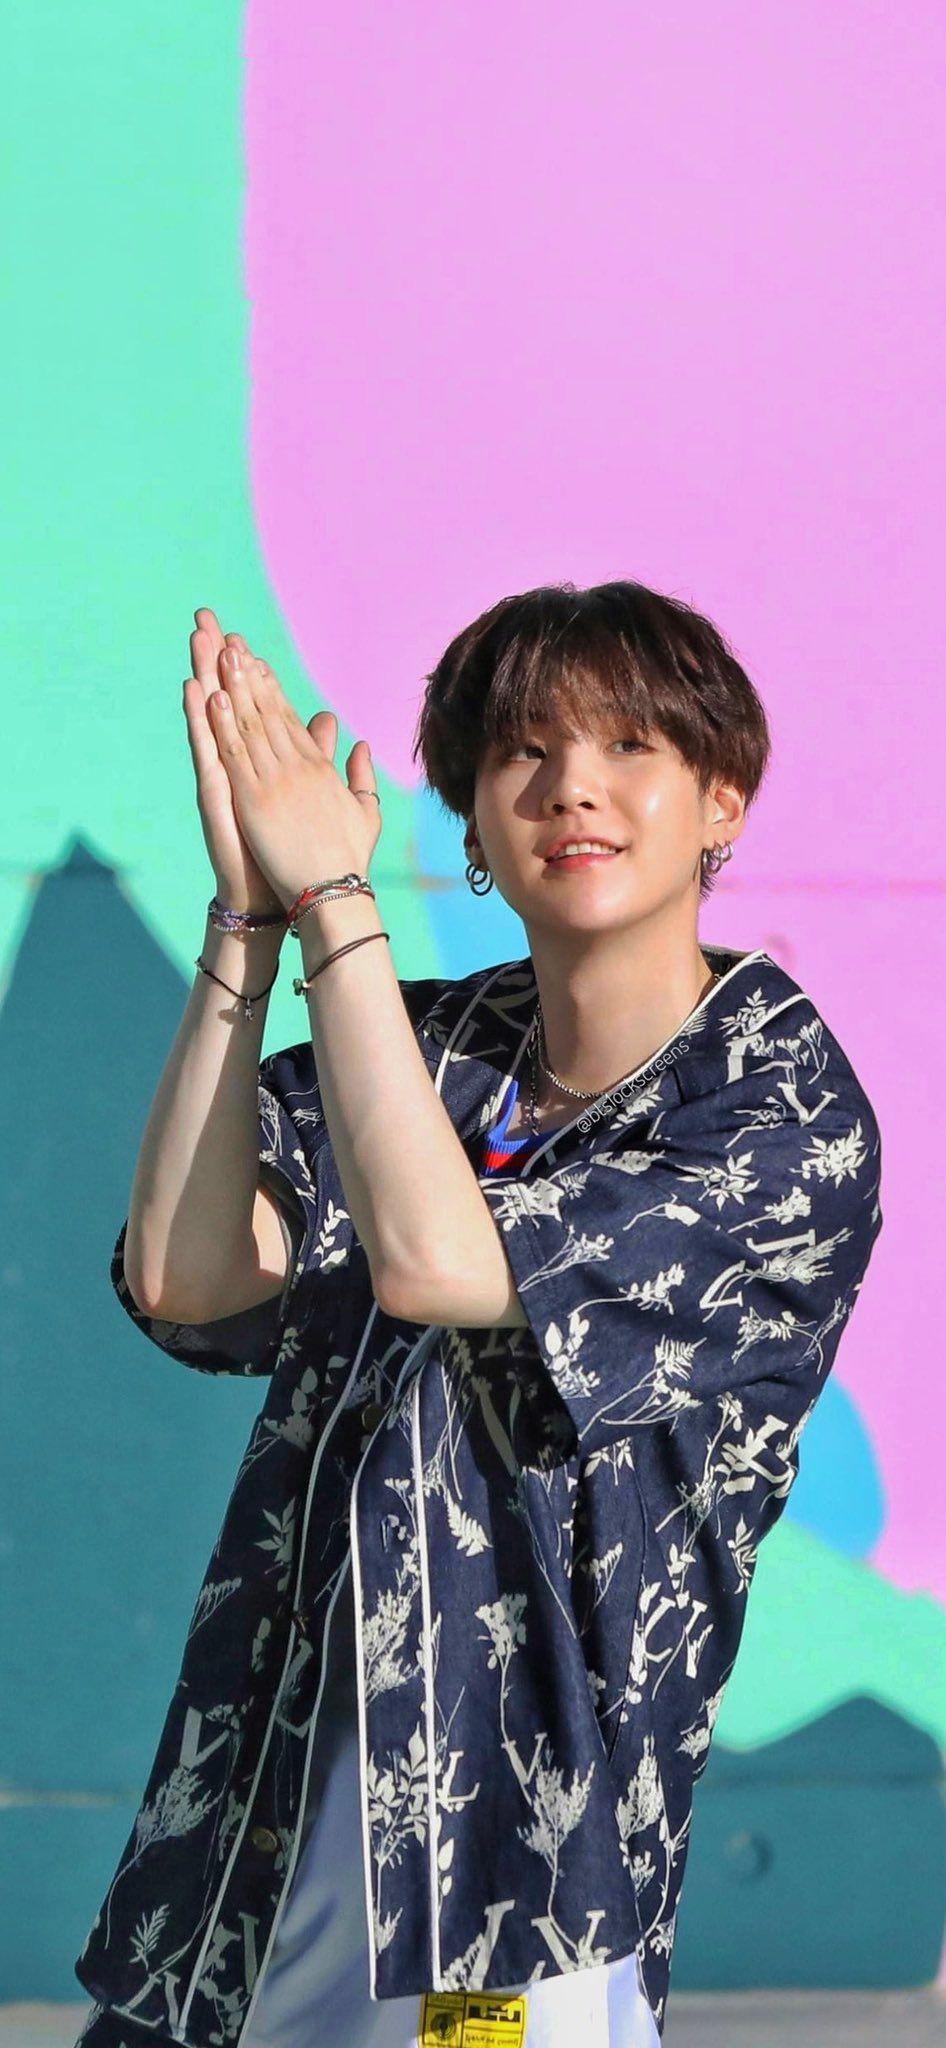 Here On Twitter Suga Bts Swag Min Yoongi Wallpaper Min Yoongi Bts Bts suga wallpaper hd 2021